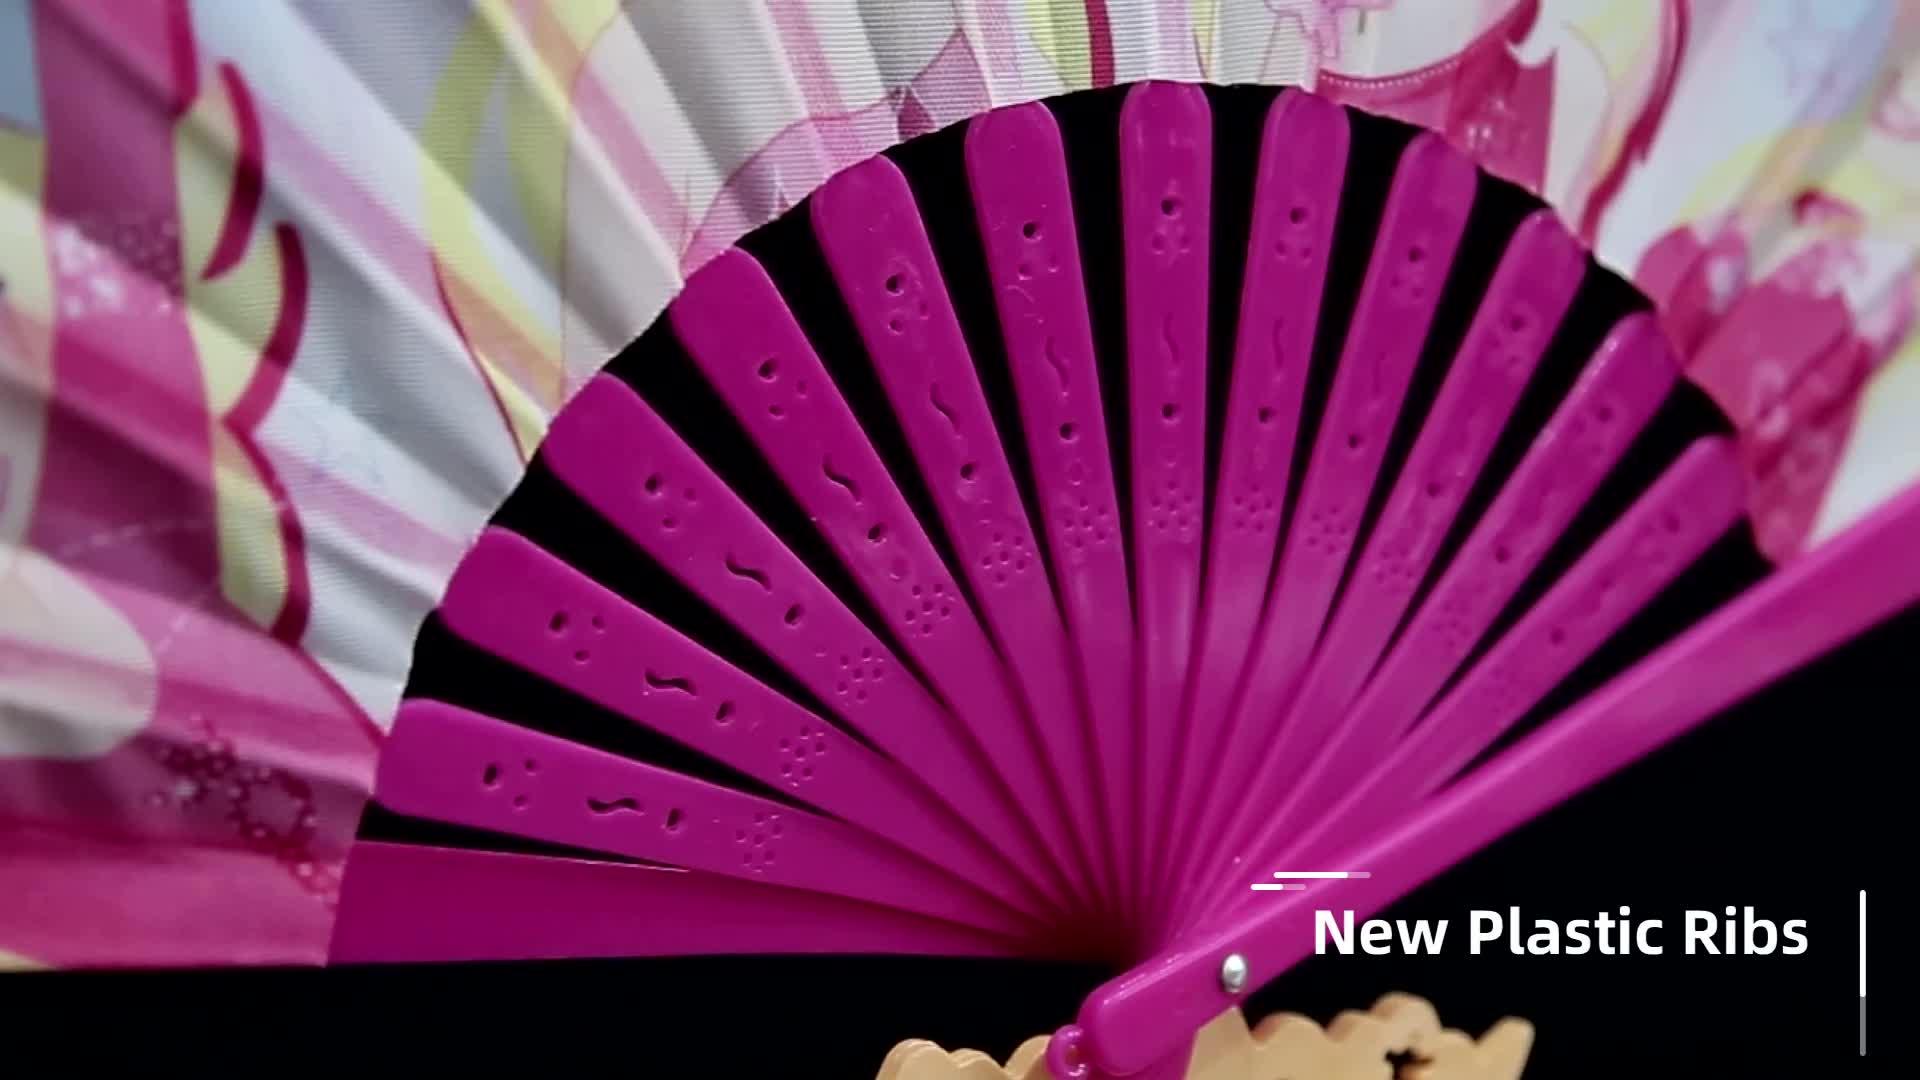 [I AM แฟนๆของคุณ] ขายร้อน 9 นิ้ว/23 ซม. L Classic Gitana Hechicera เต้นรำมือพัดลมสีขาวแต่งงานพัดลม 27 สีสำหรับเลือก